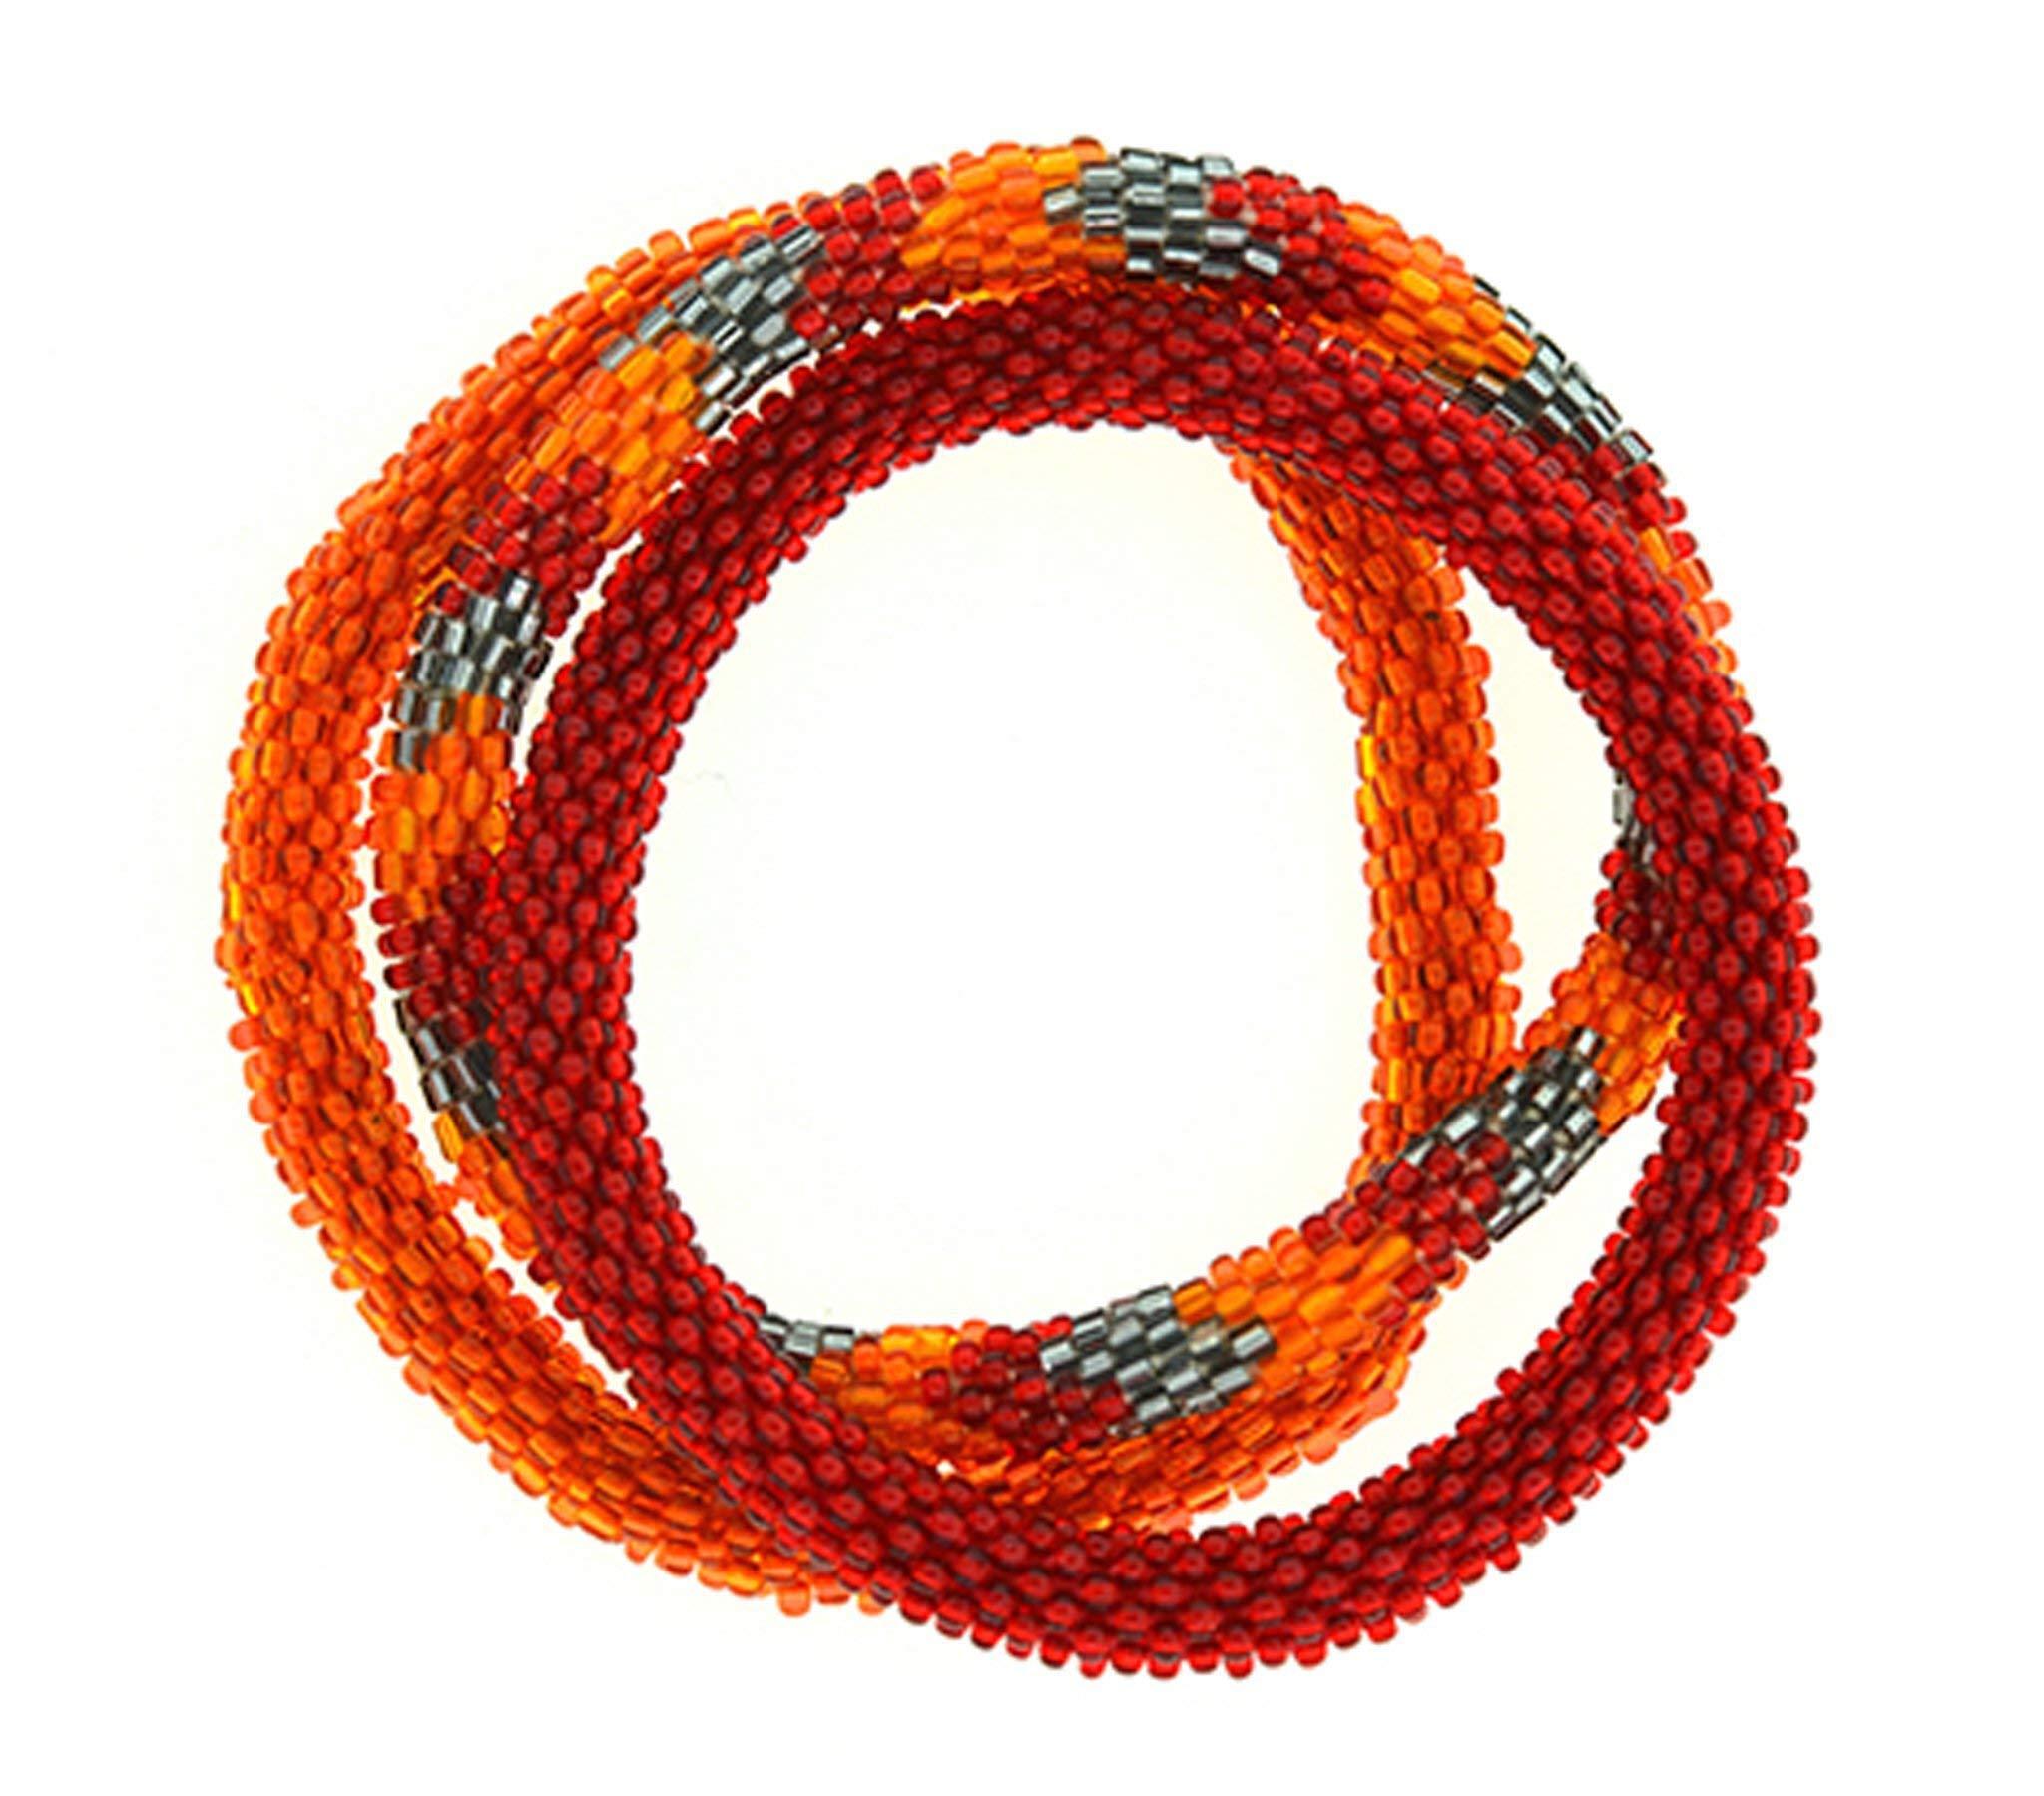 Aid Through Trade Team Spirit Roll-On Bracelets - Burgundy & Orange